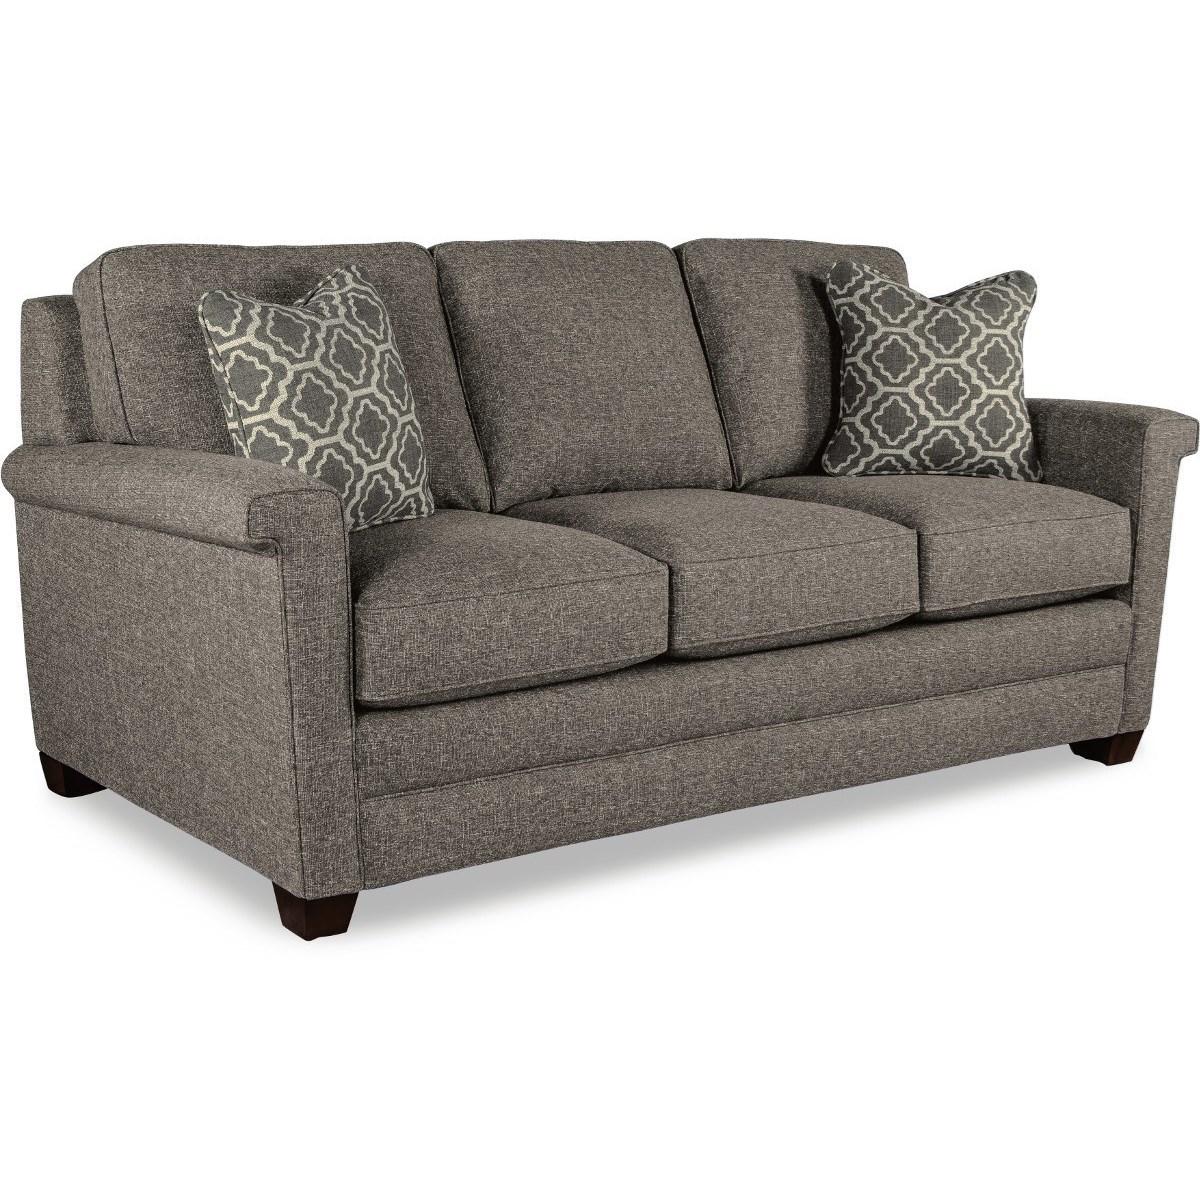 comfortable queen sleeper sofa leather sectional dallas tx la z boy bexley contemporary conlin 39s